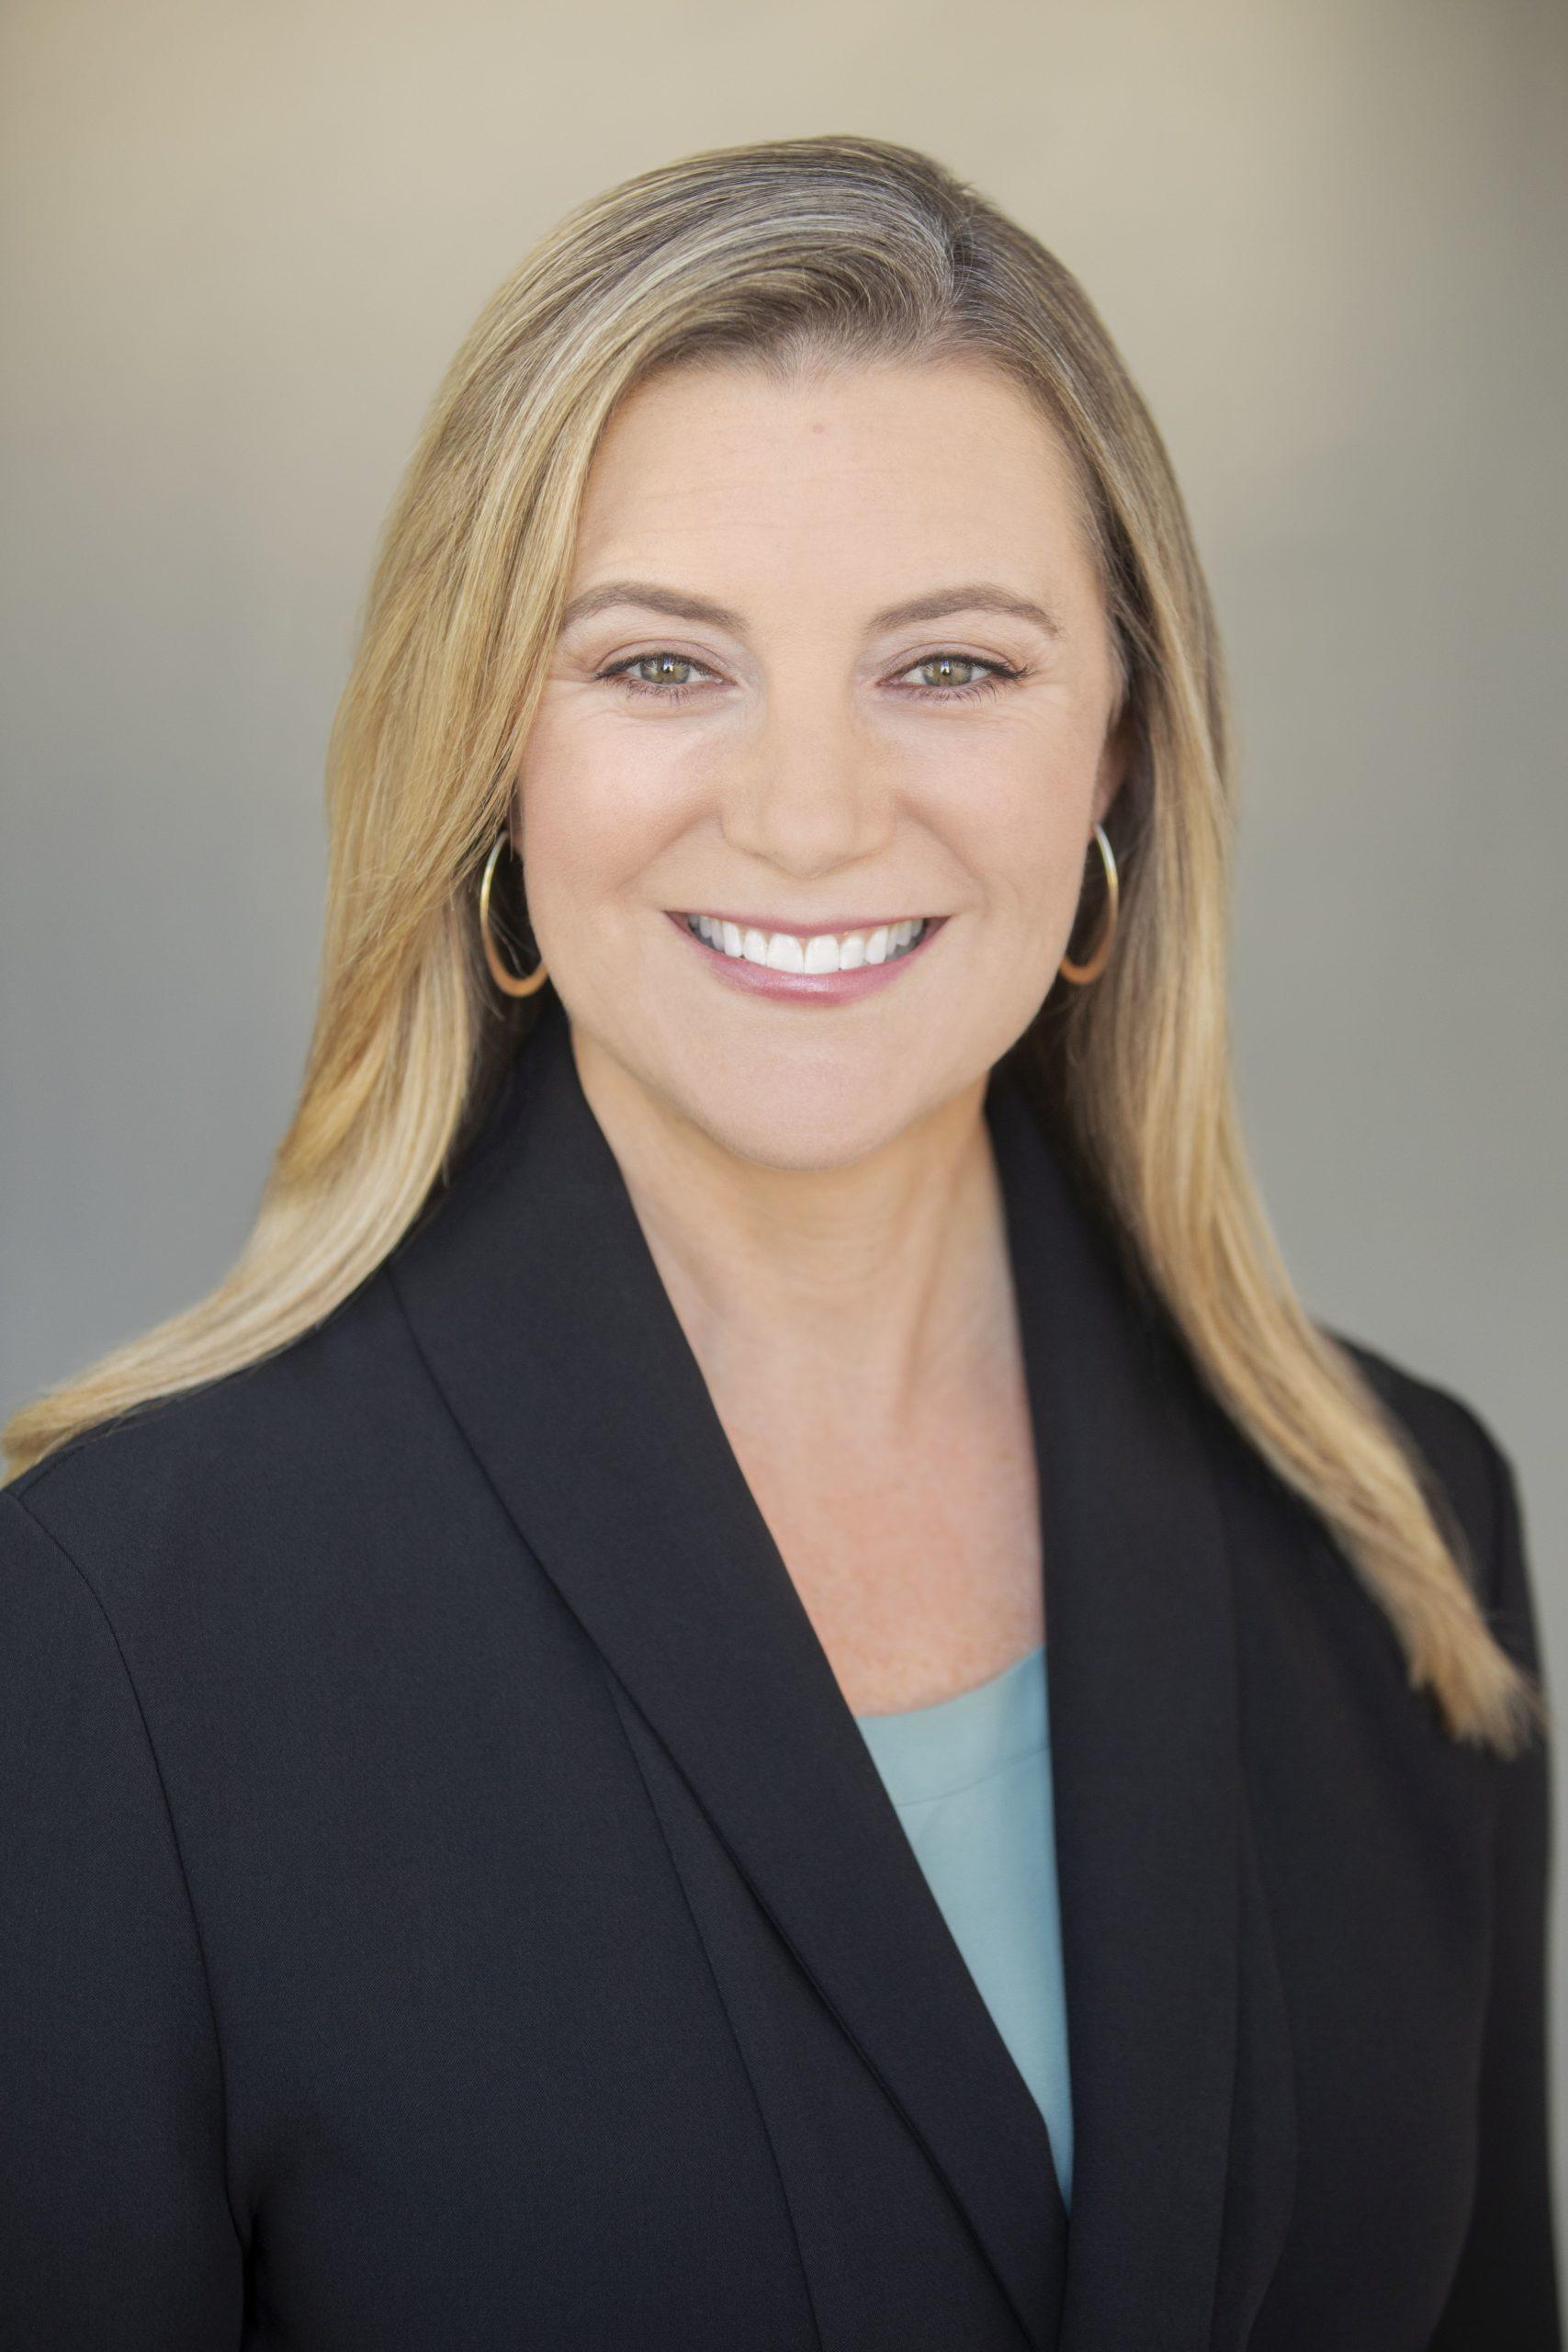 Amanda Norton